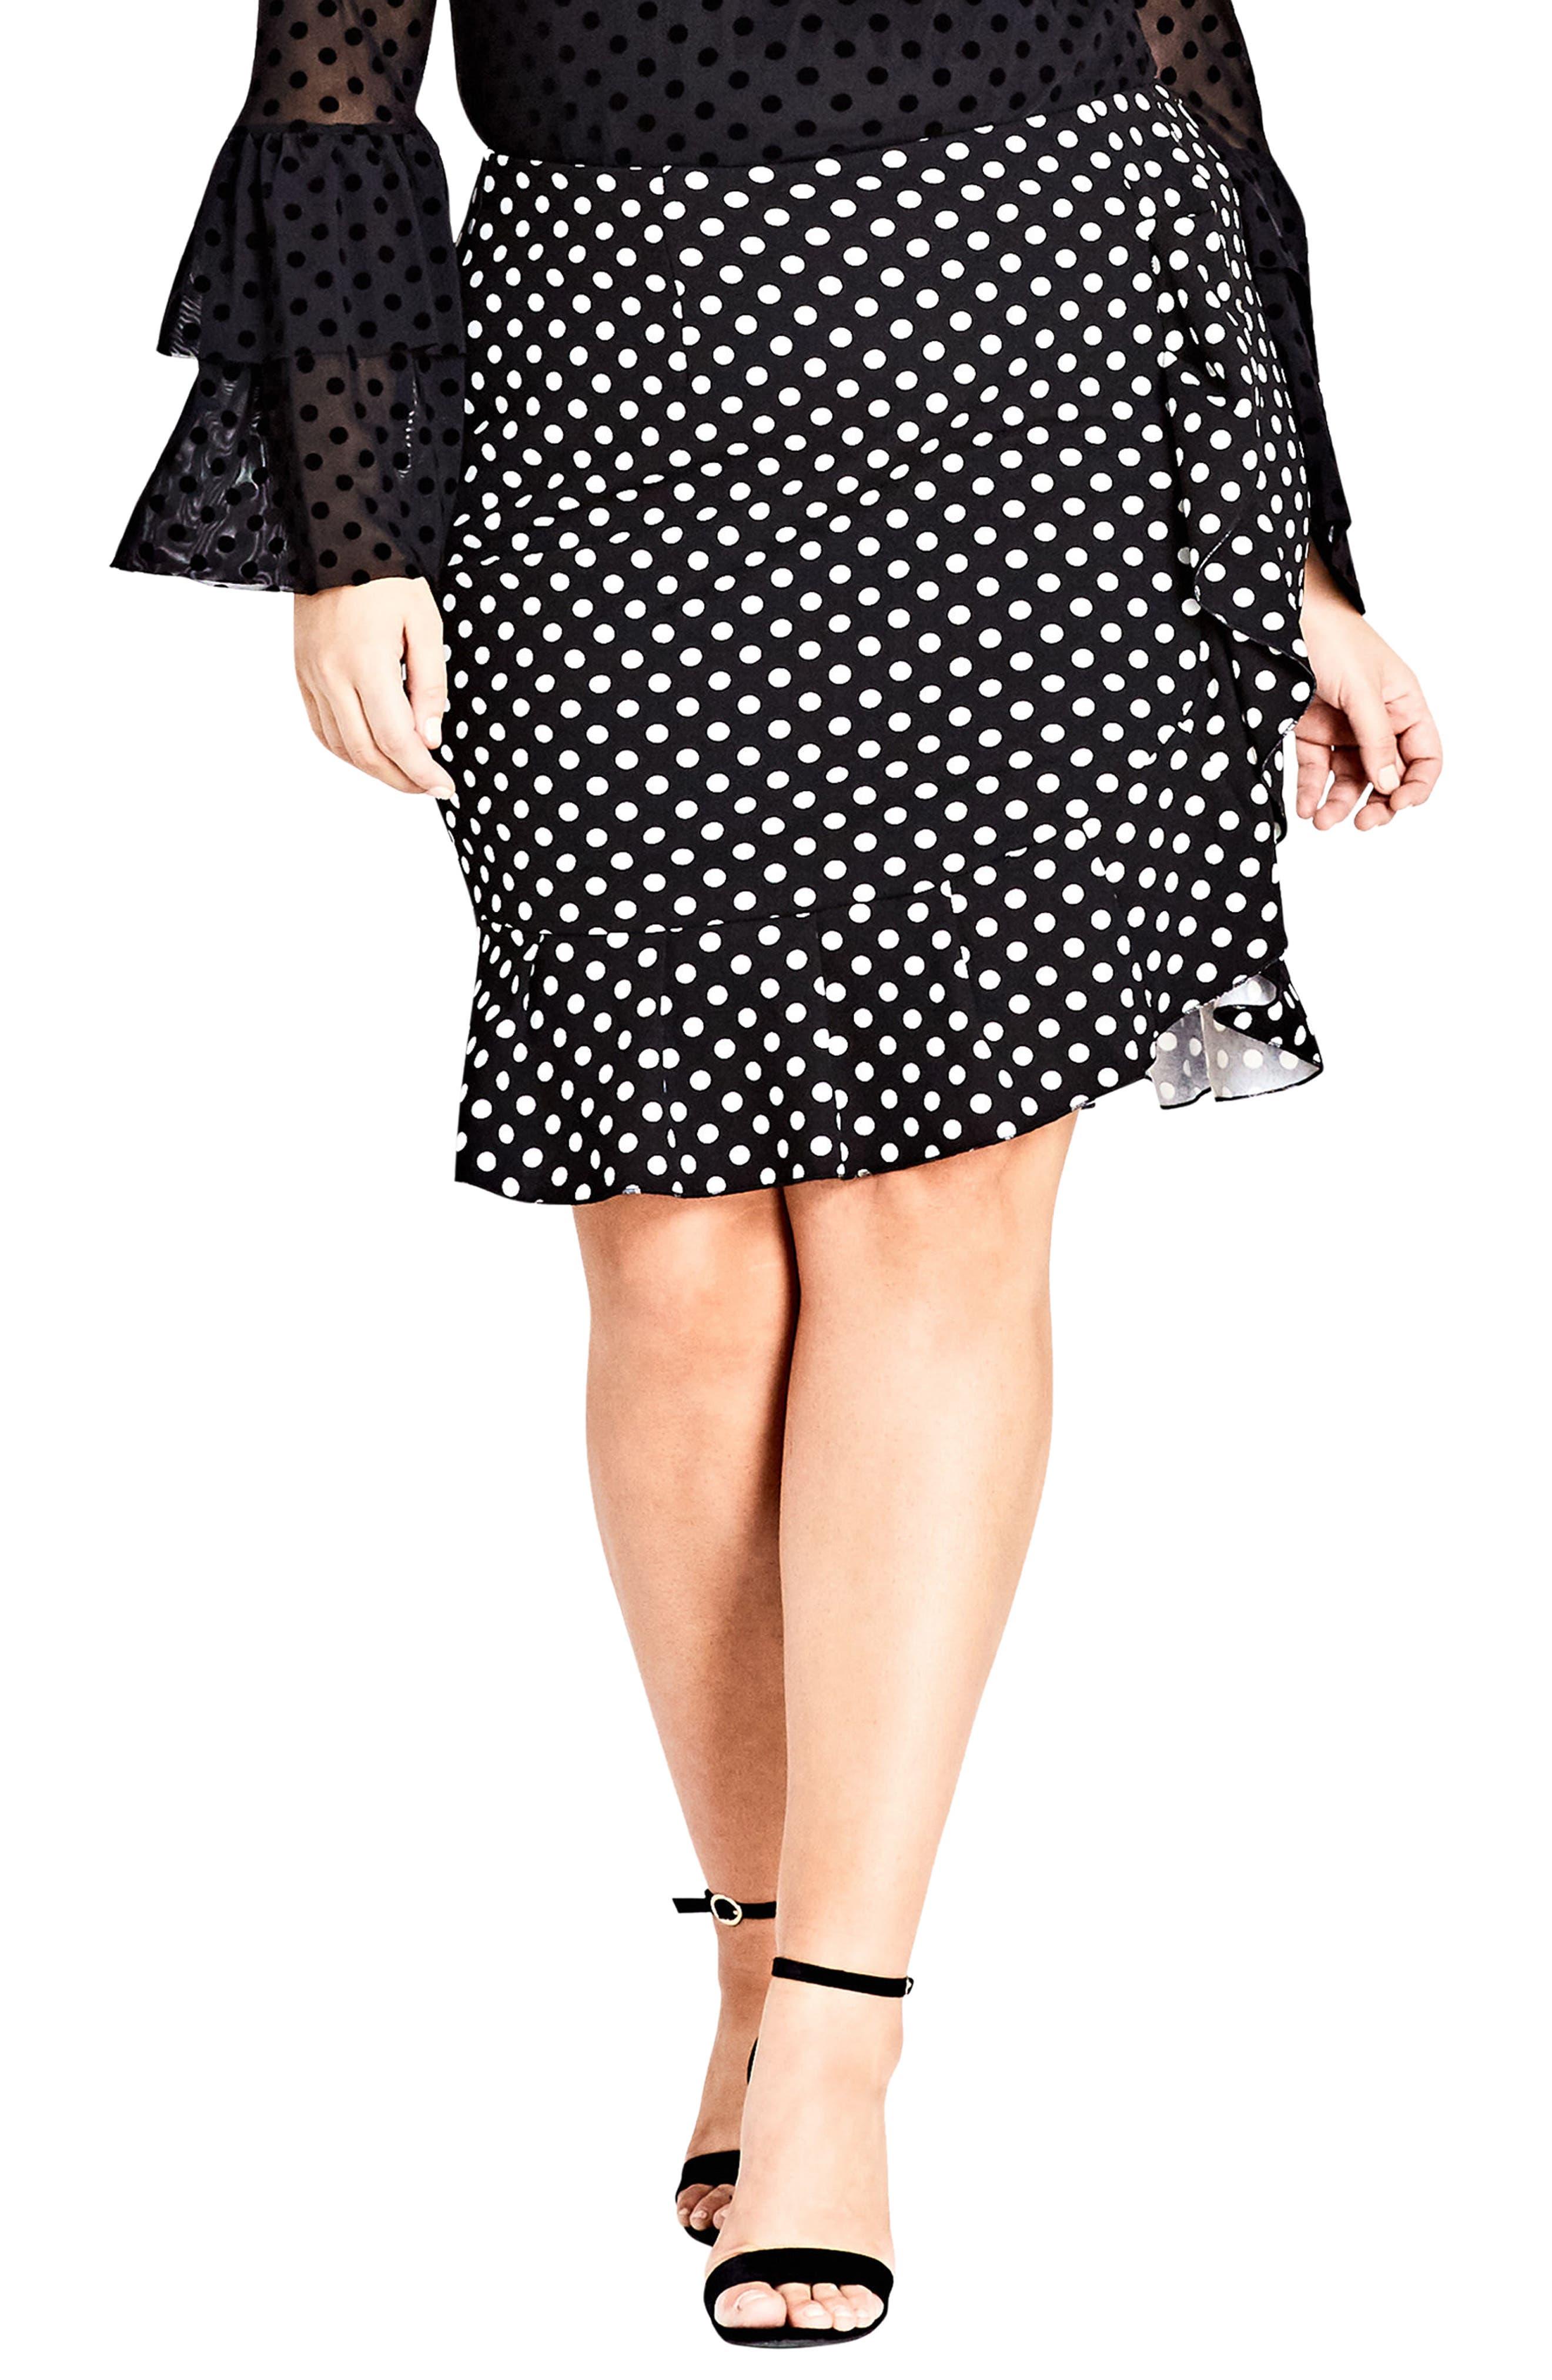 Plus Size City Chic Spot Frill Skirt, Black